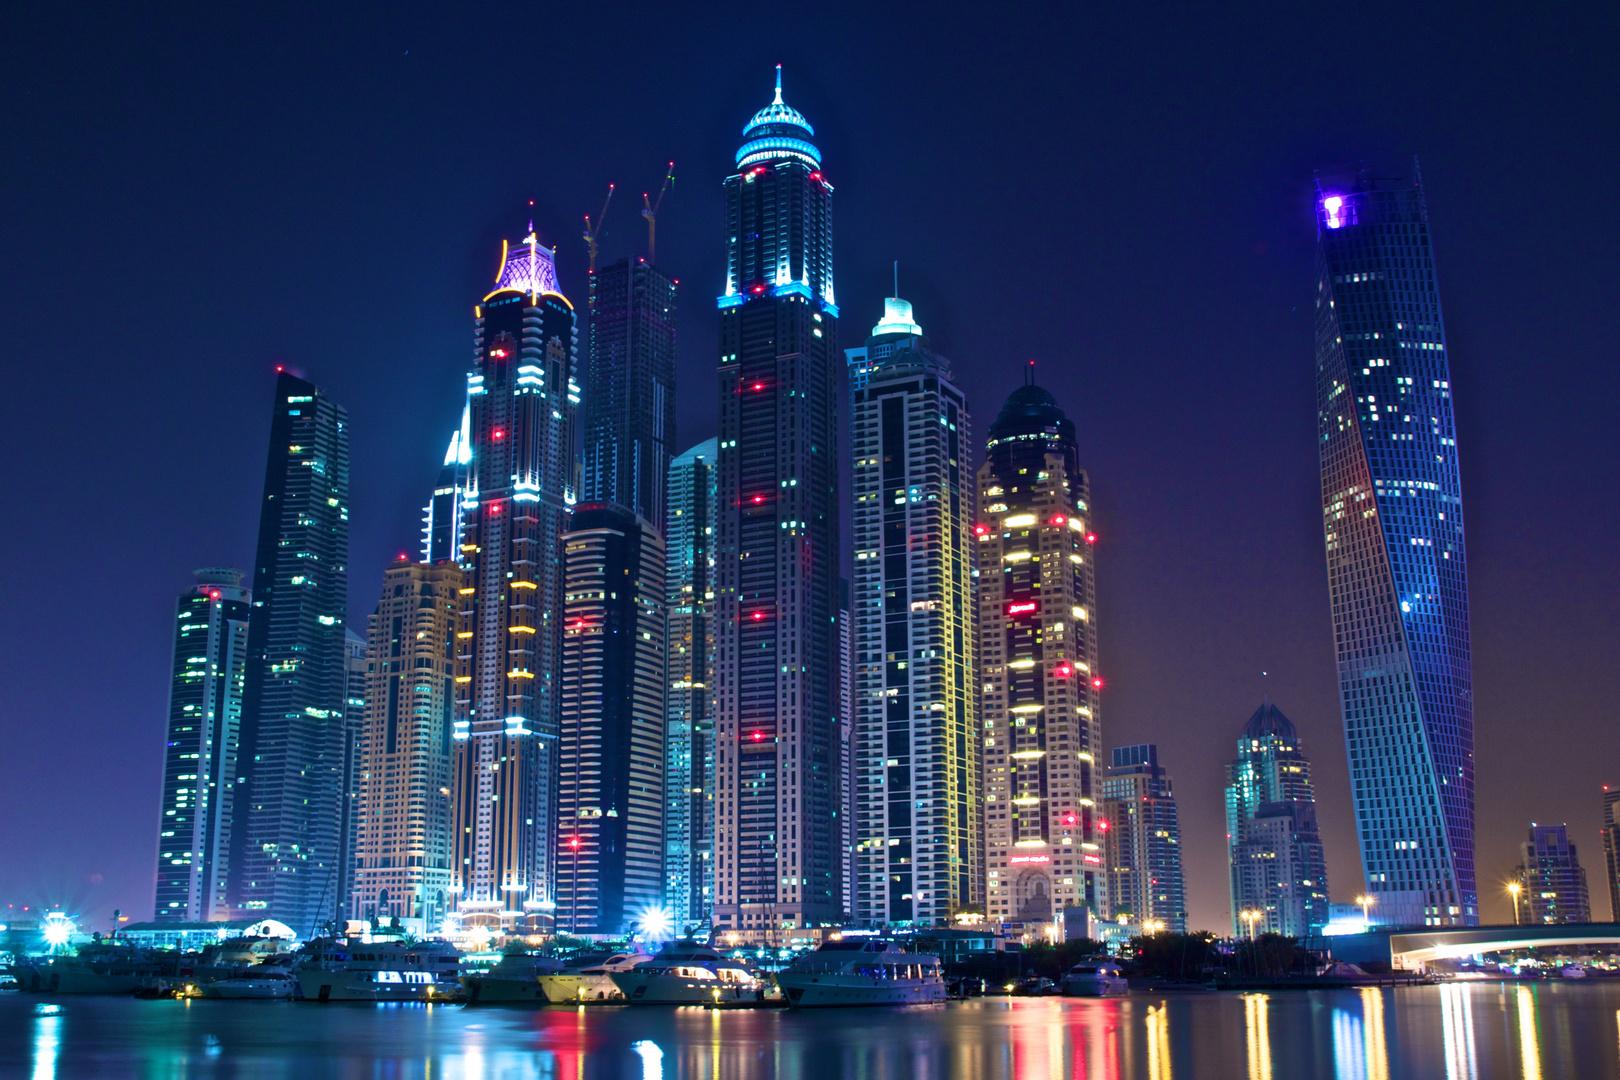 Skyline of Dubai Marina